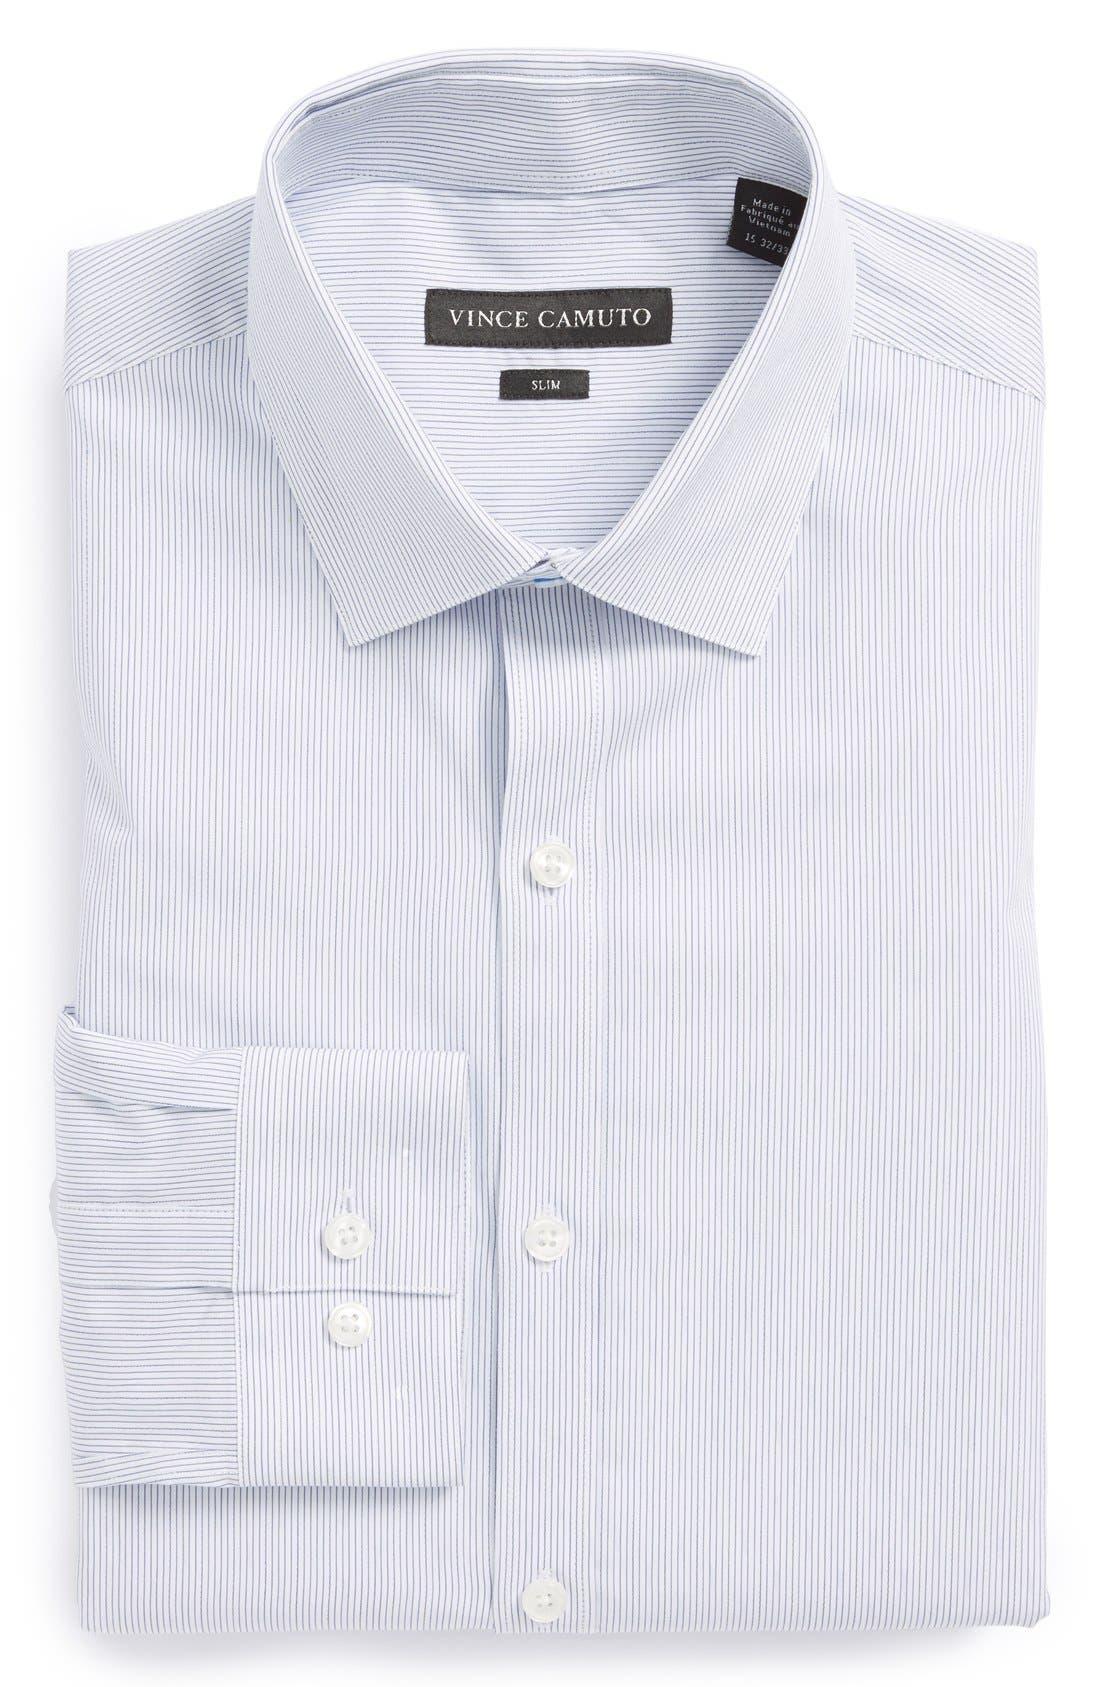 Alternate Image 1 Selected - Vince Camuto Slim Fit Stripe Dress Shirt